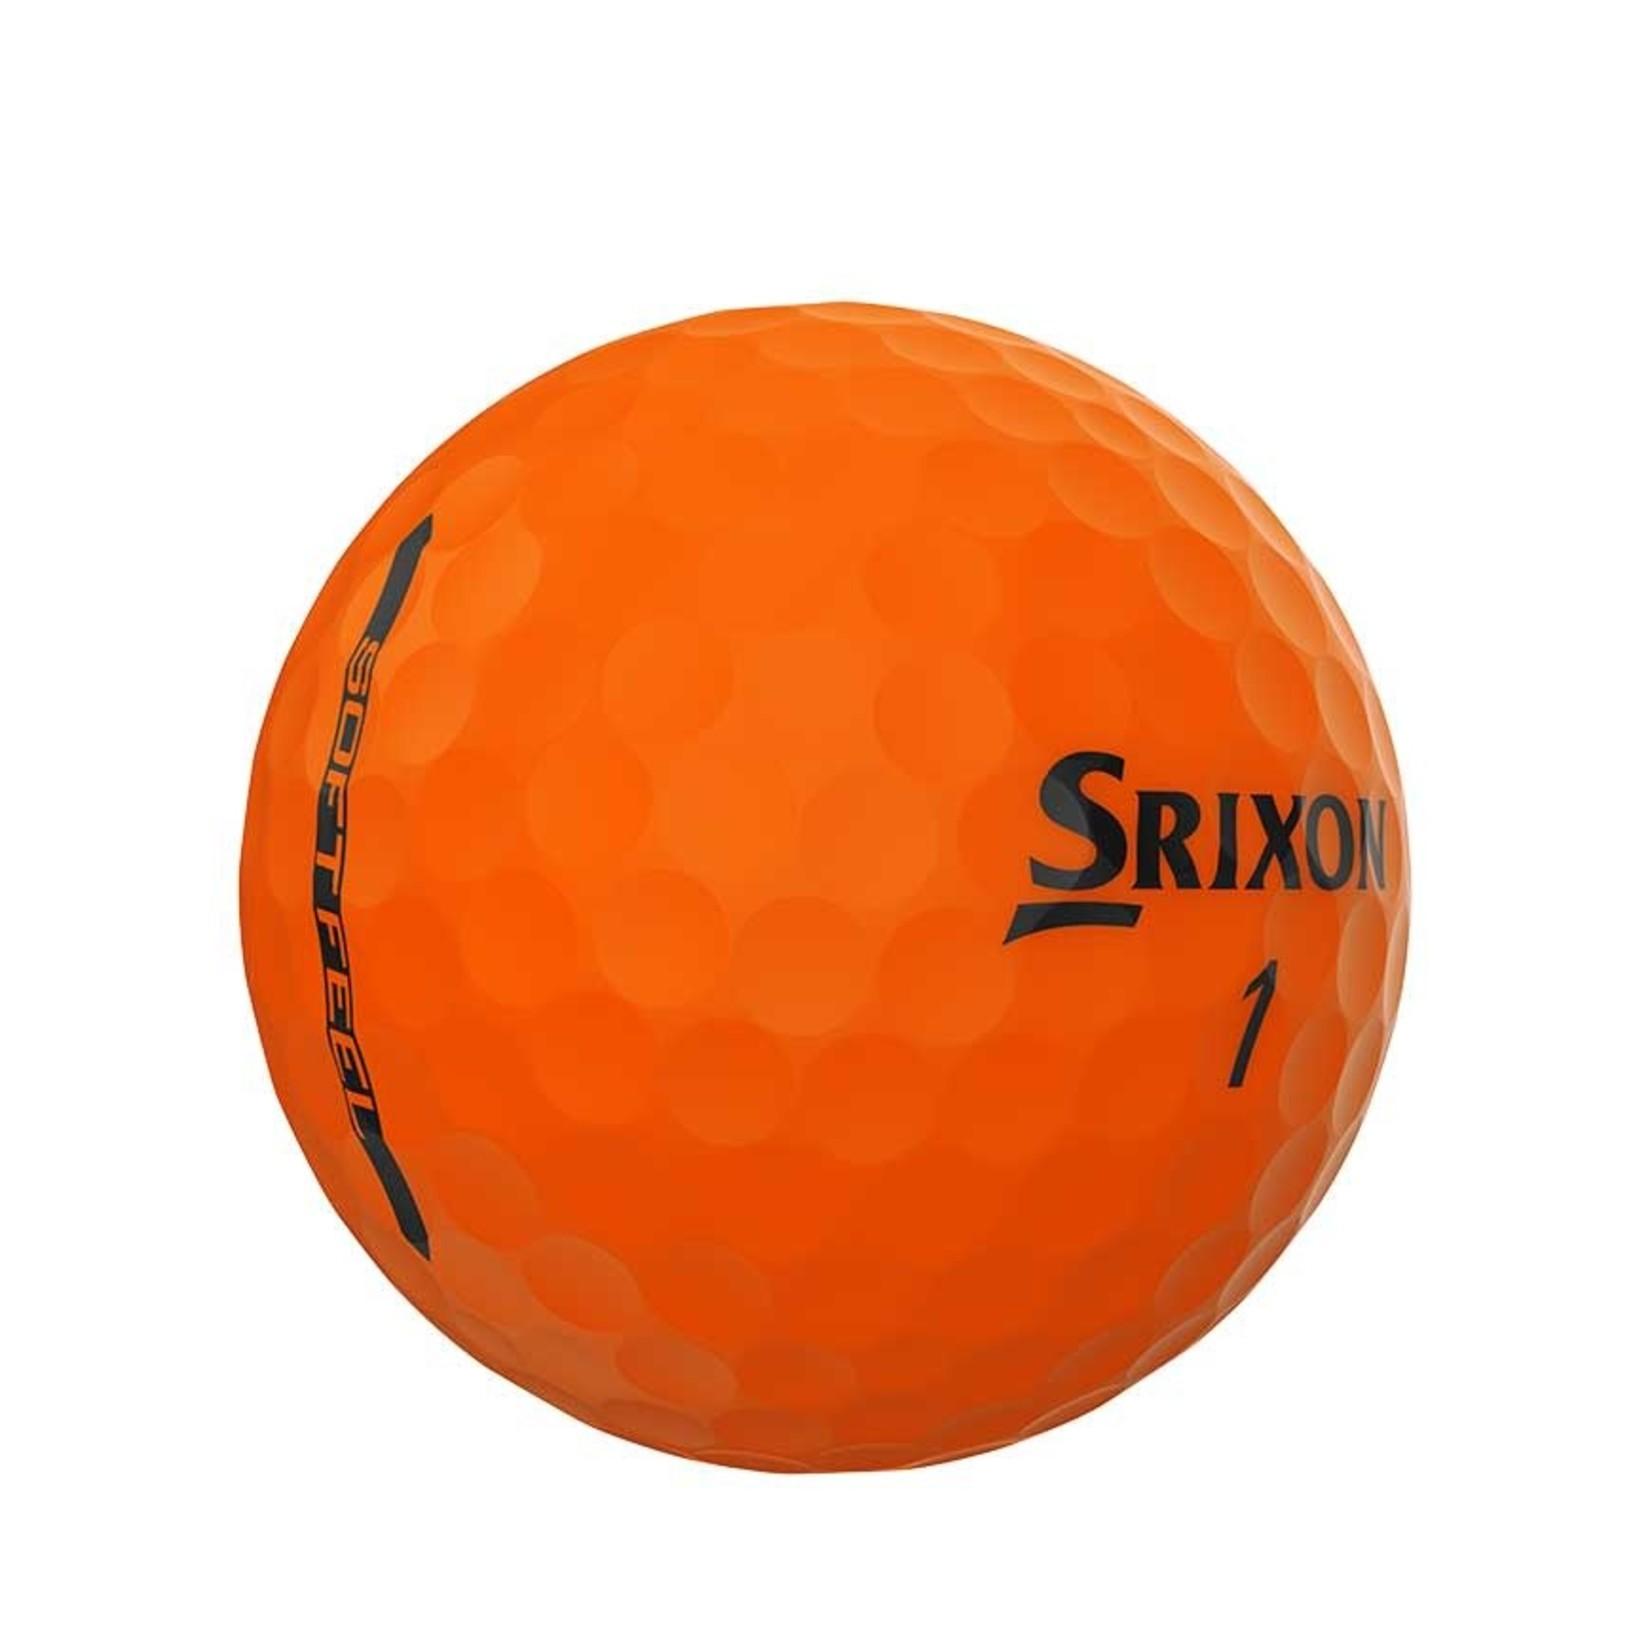 Srixon Srixon SoftFeel Brite Orange